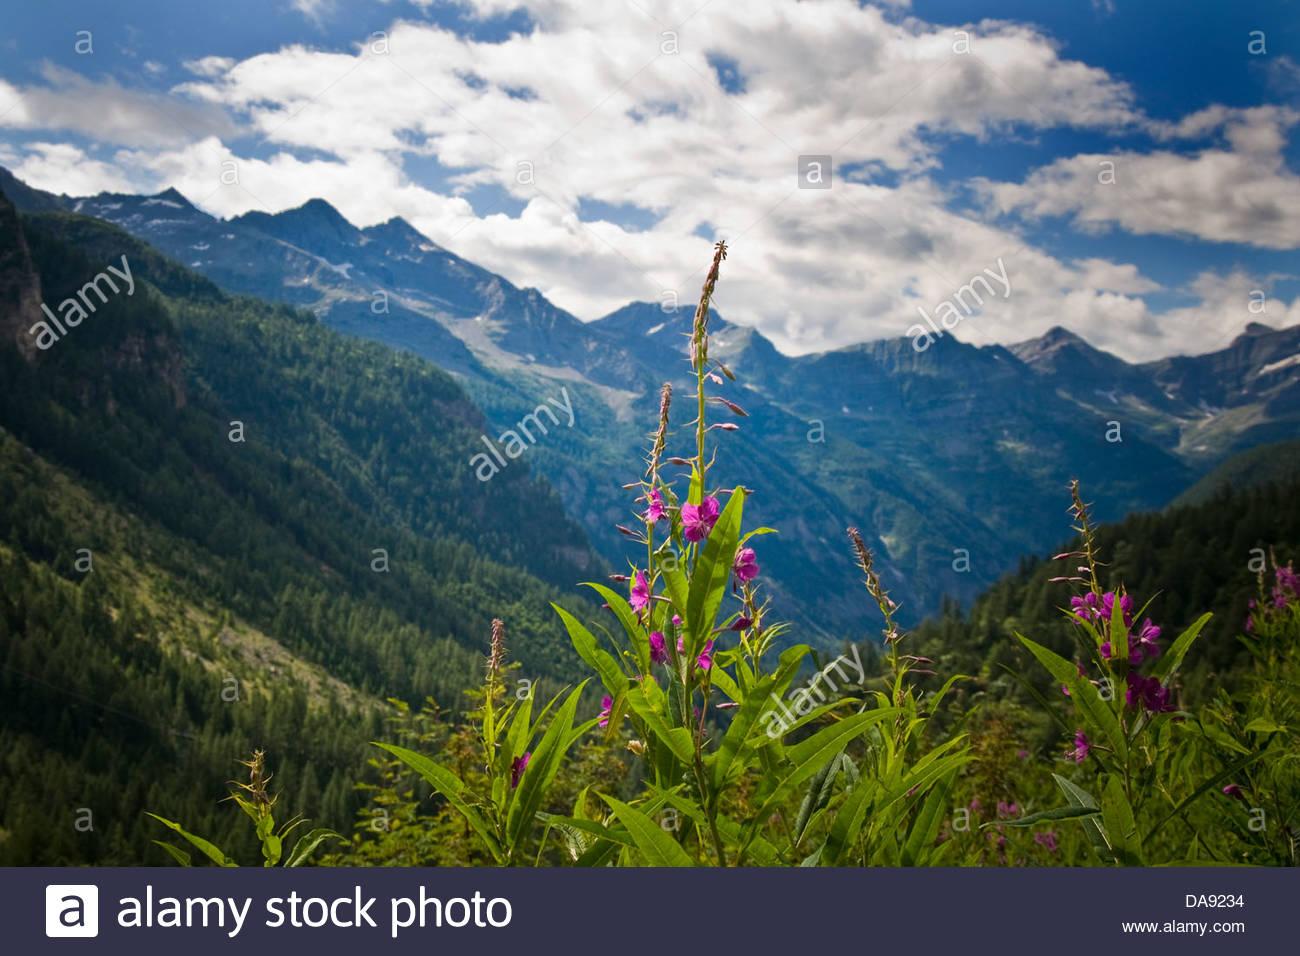 Italy,Piedmont,Formazza valley,landscape - Stock Image